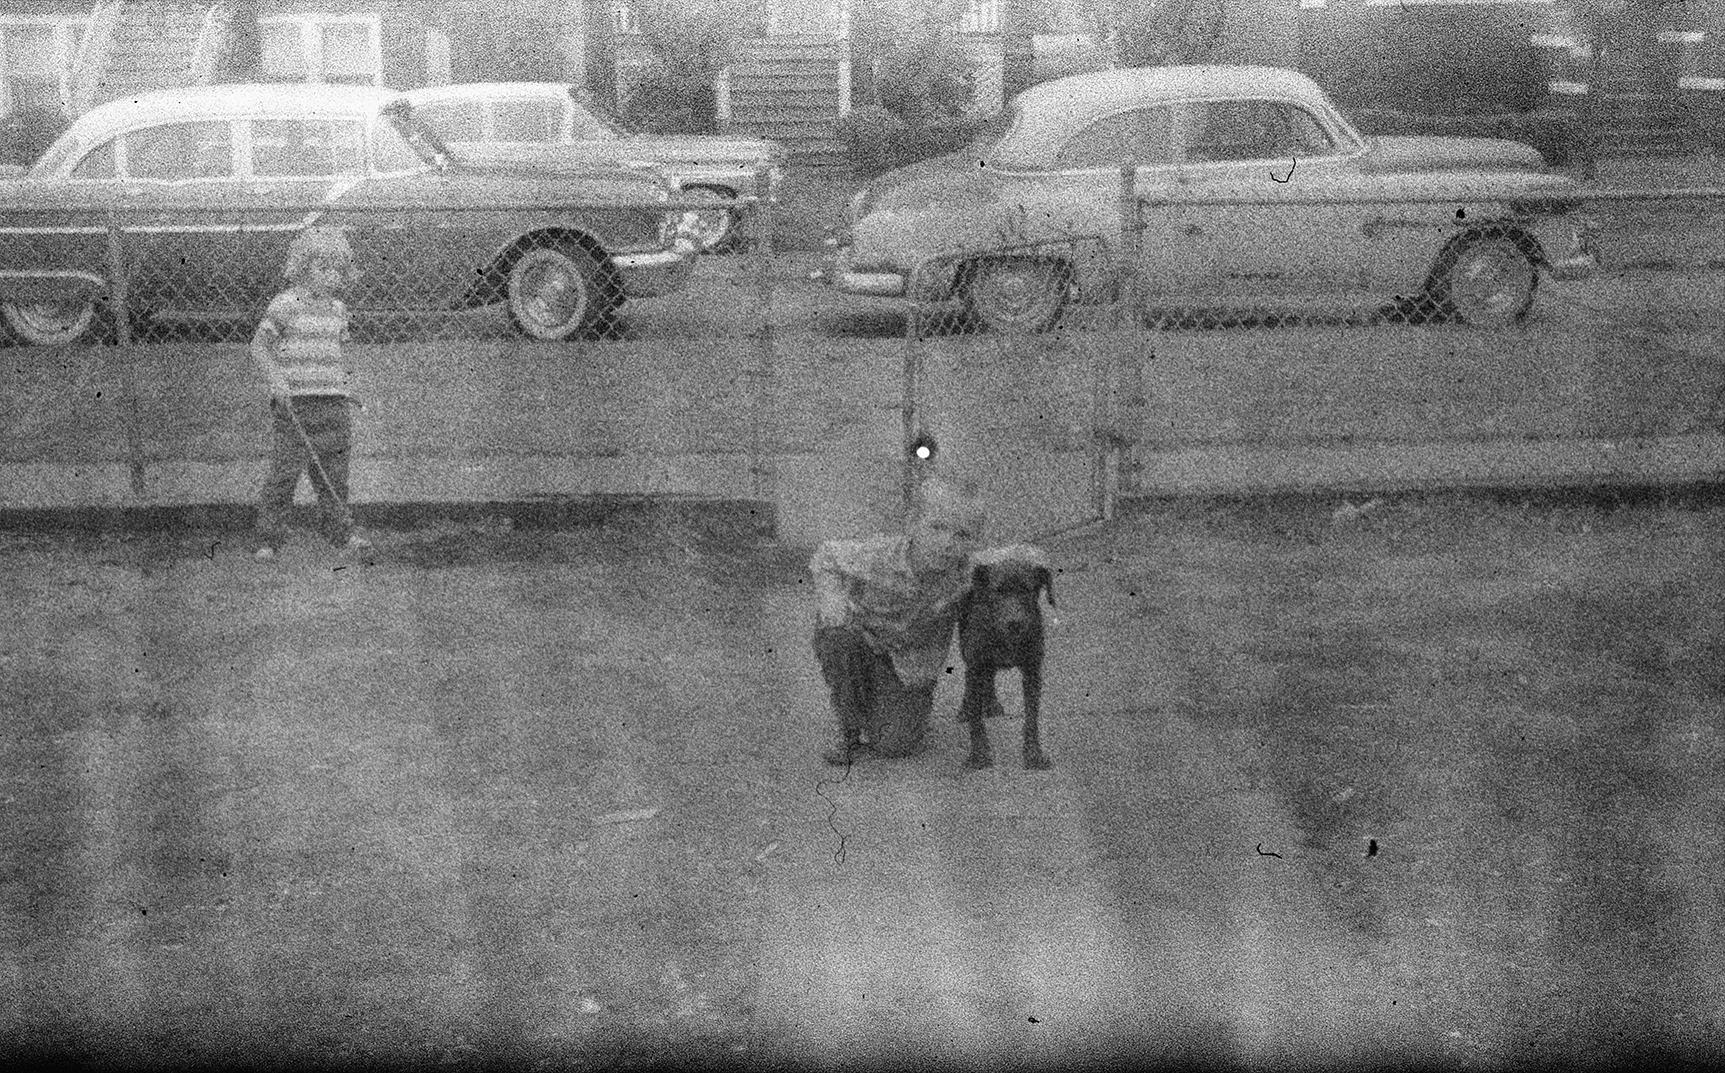 Paul Bundle 66 Roll 5 003.jpg